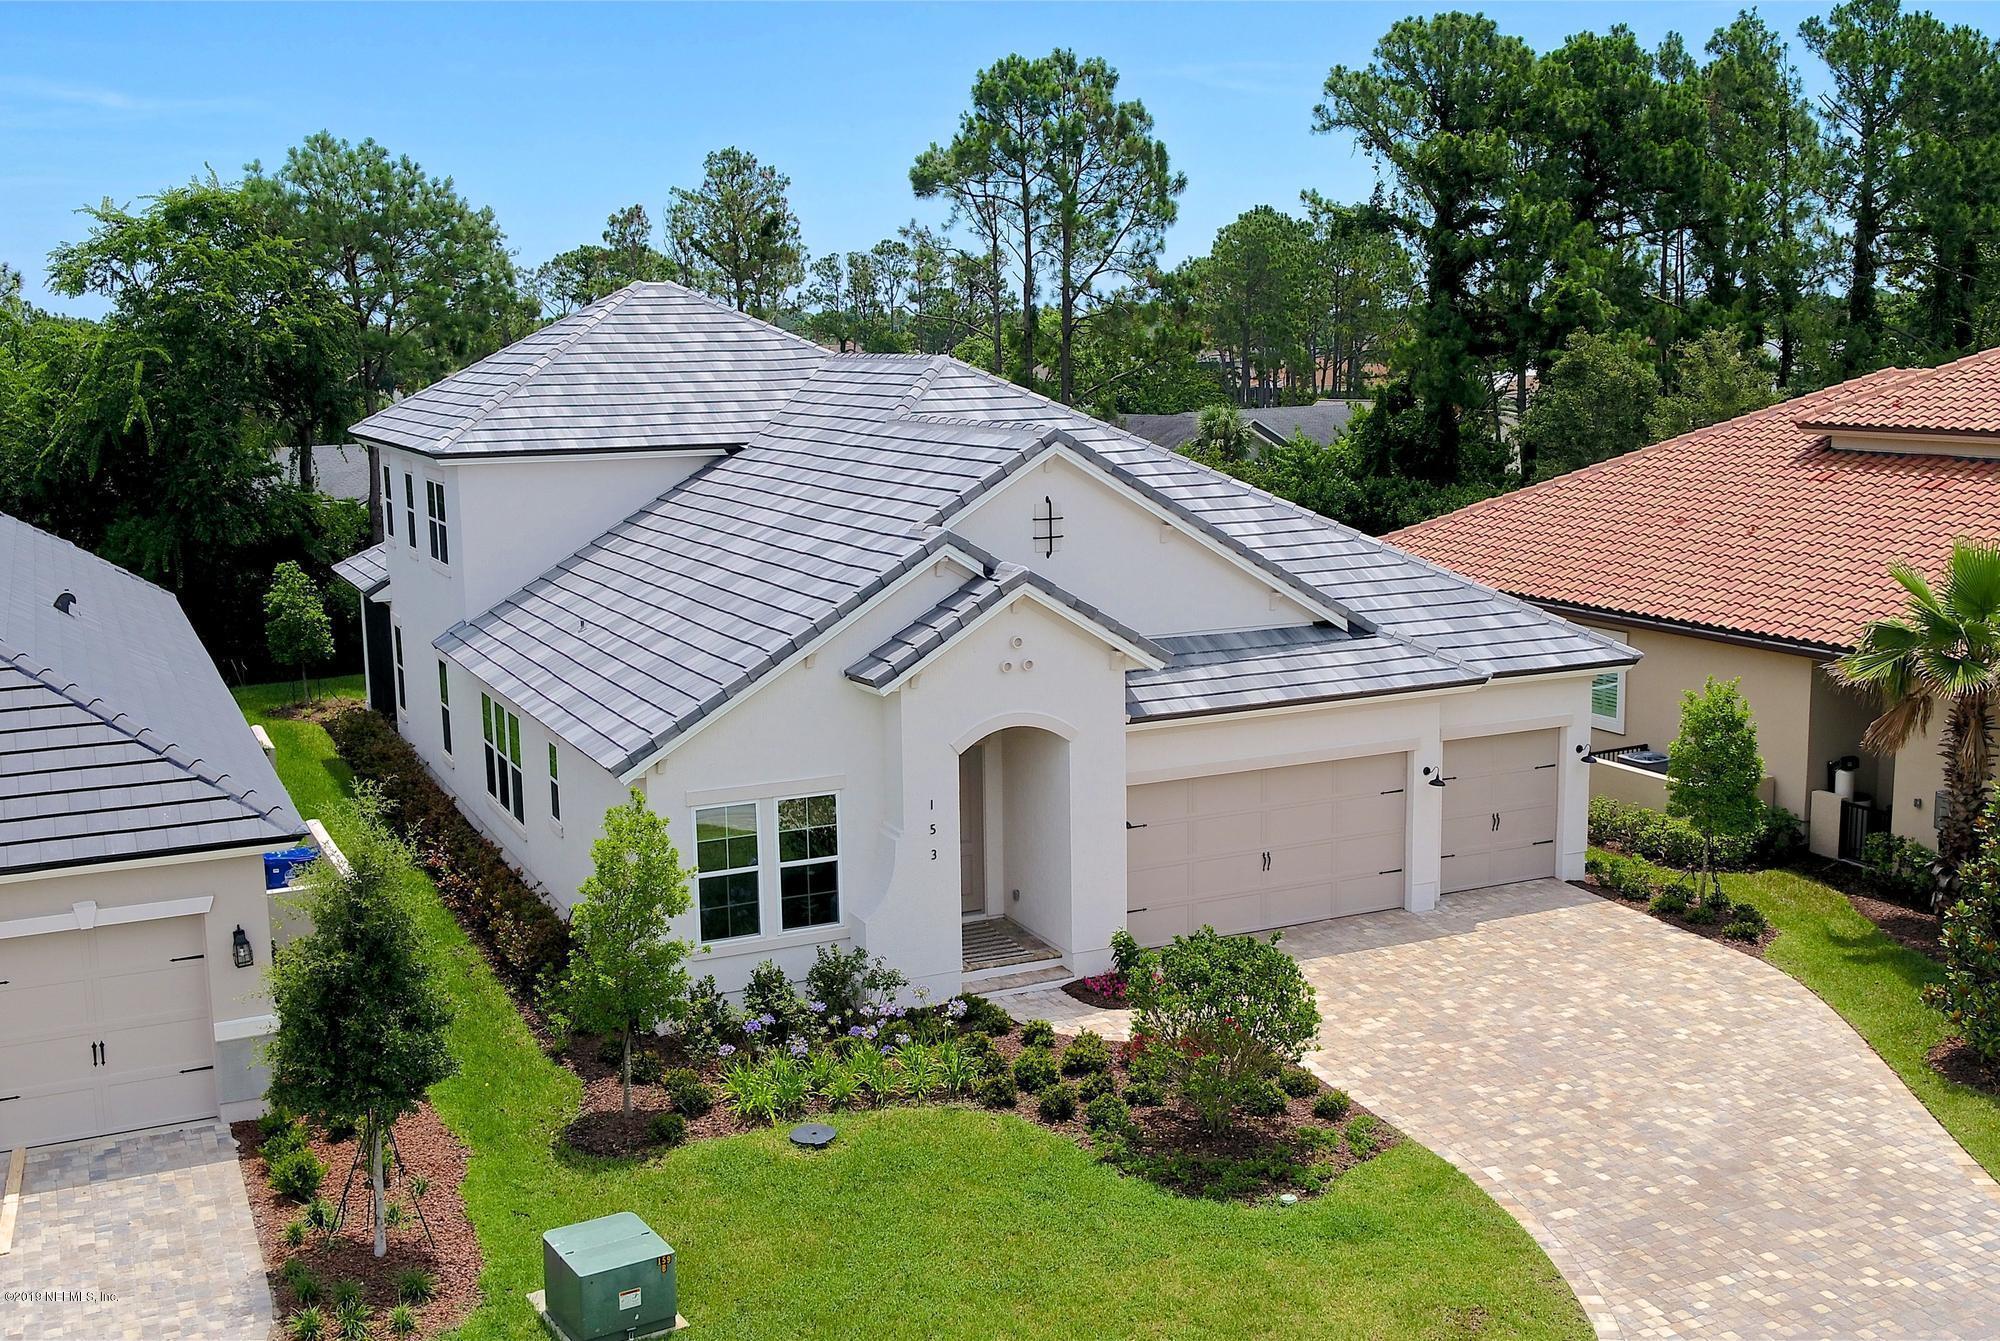 153 HOLLYHOCK, PONTE VEDRA BEACH, FLORIDA 32082, 4 Bedrooms Bedrooms, ,4 BathroomsBathrooms,Residential - single family,For sale,HOLLYHOCK,987979